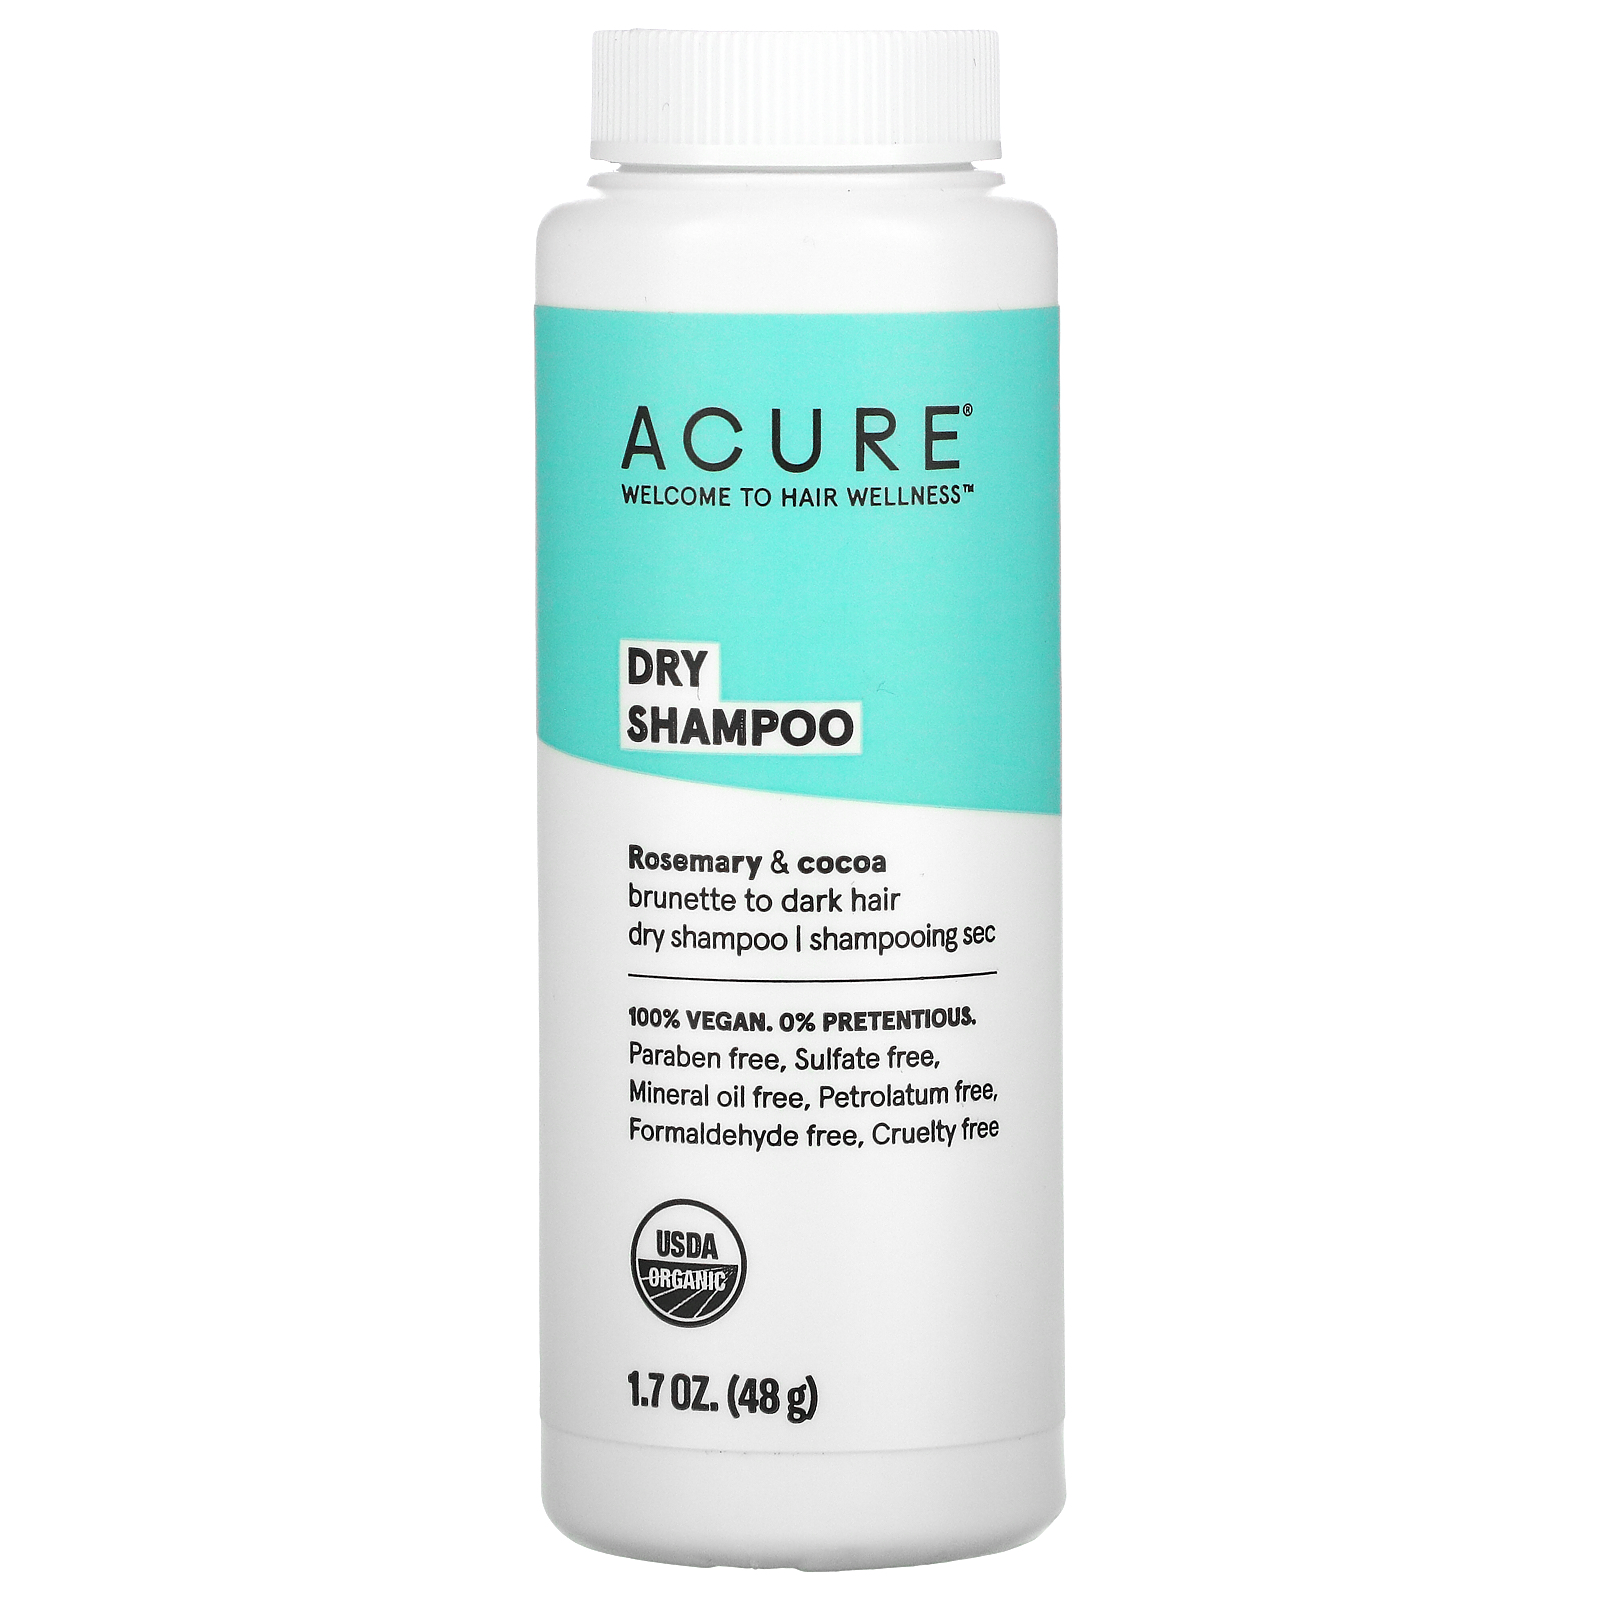 Acure Dry Shampoo Brunette To Dark Hair Rosemary Cocoa 1 7 Oz 58 G Iherb